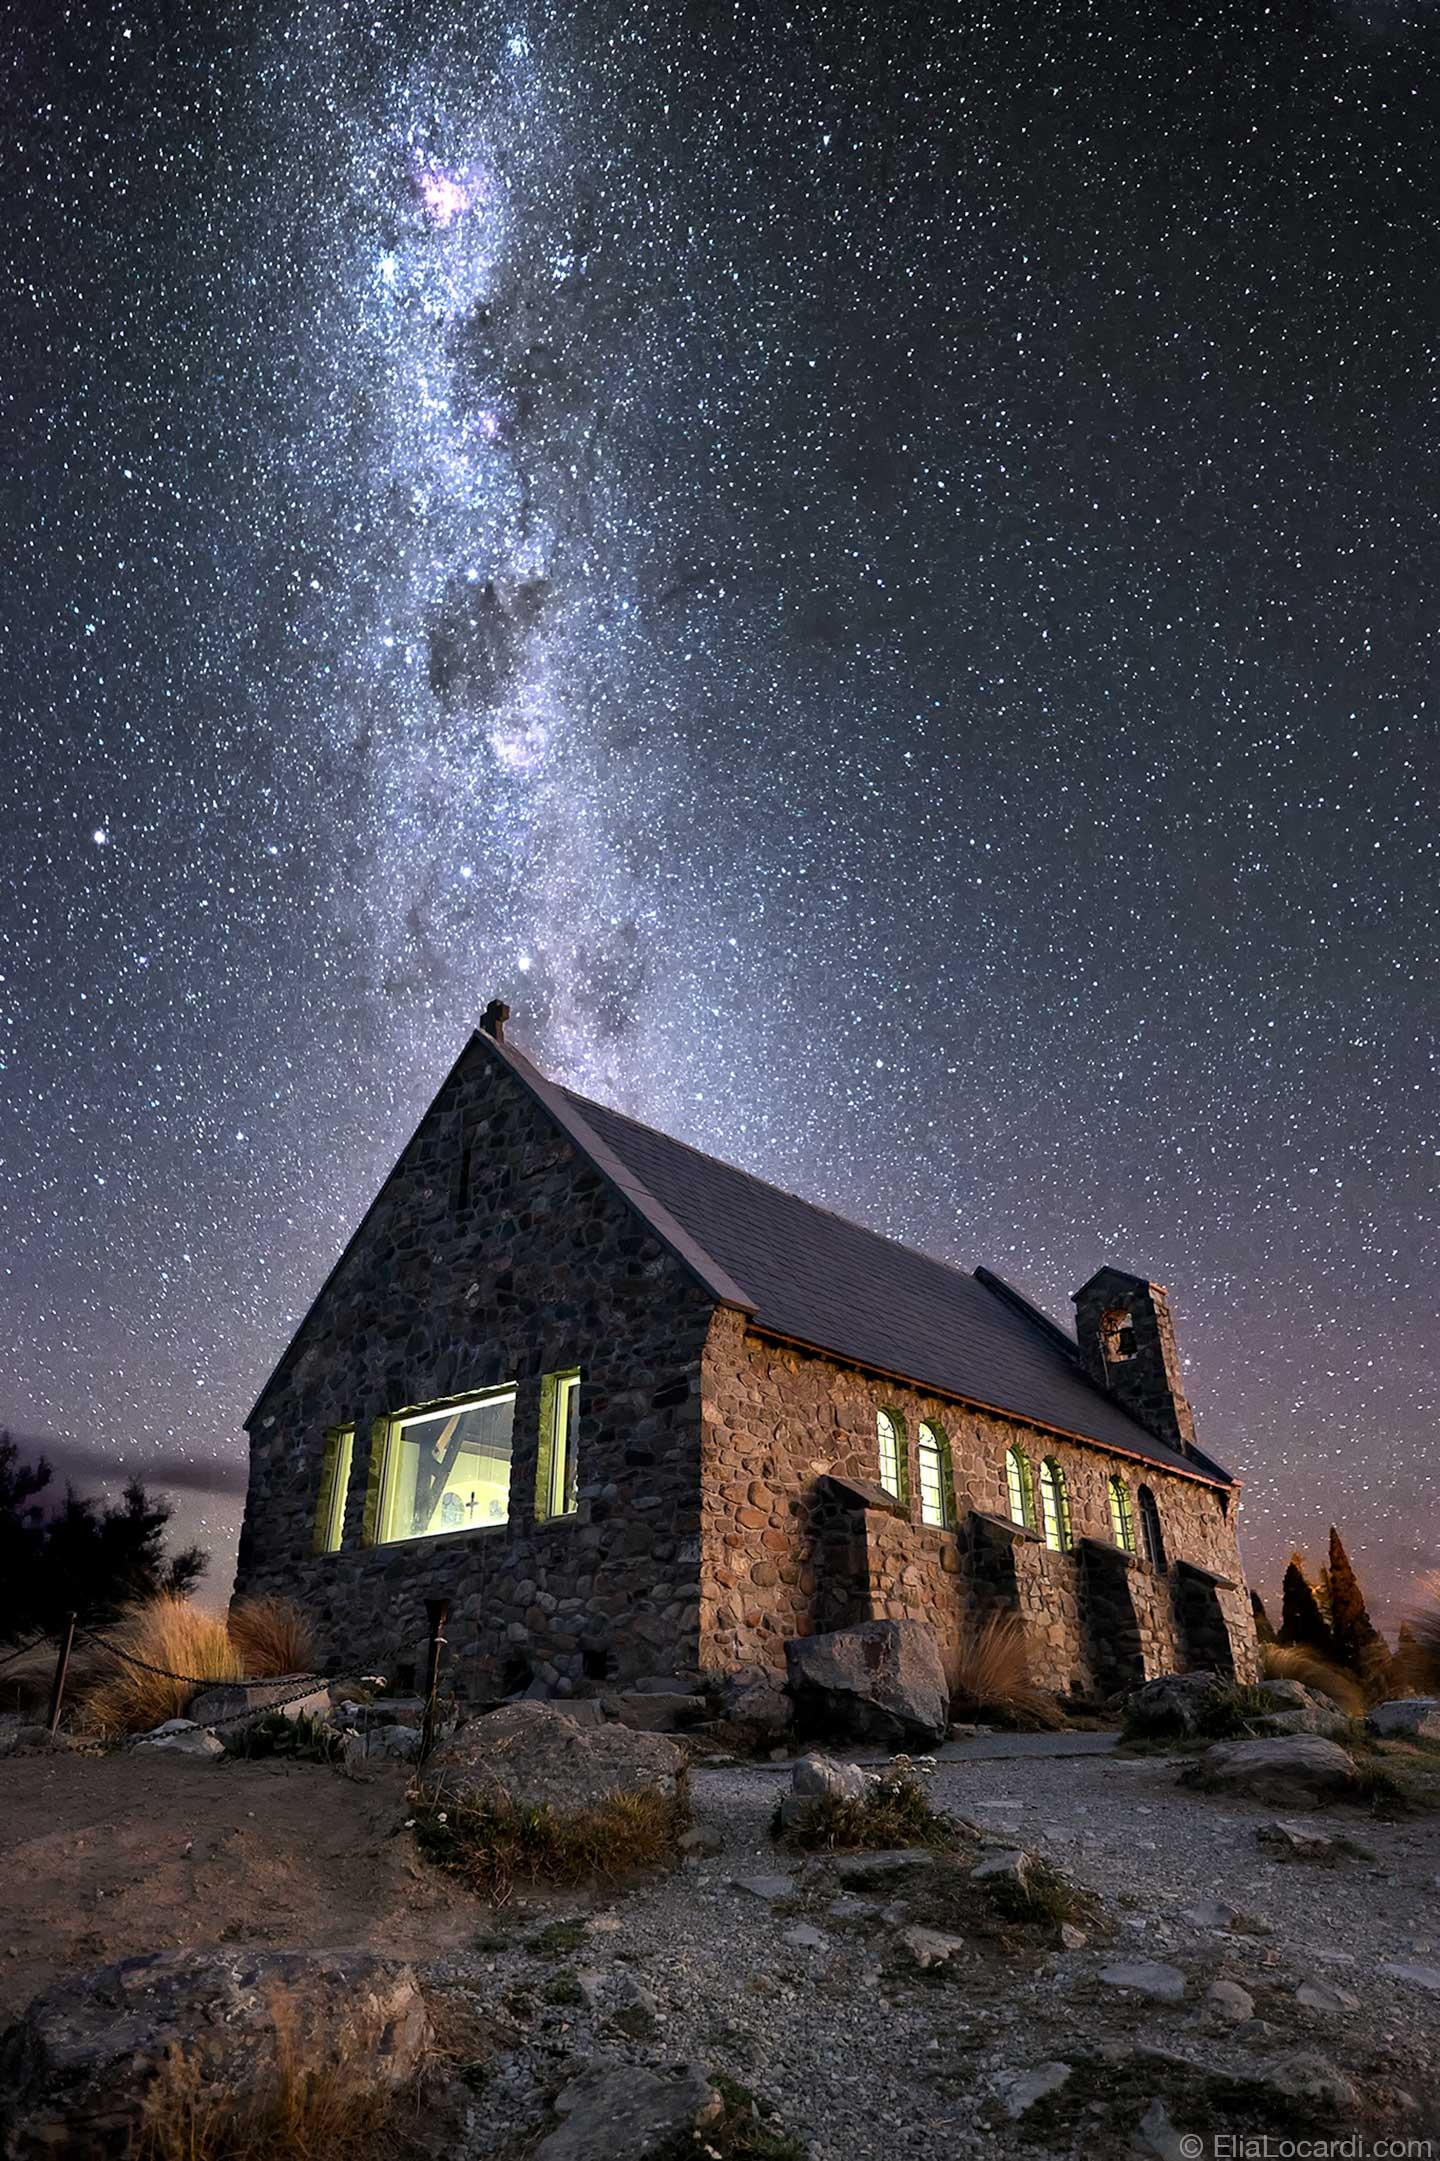 The Milky Way Galaxy dances above the Churh of the Good Shepherd in New Zealand